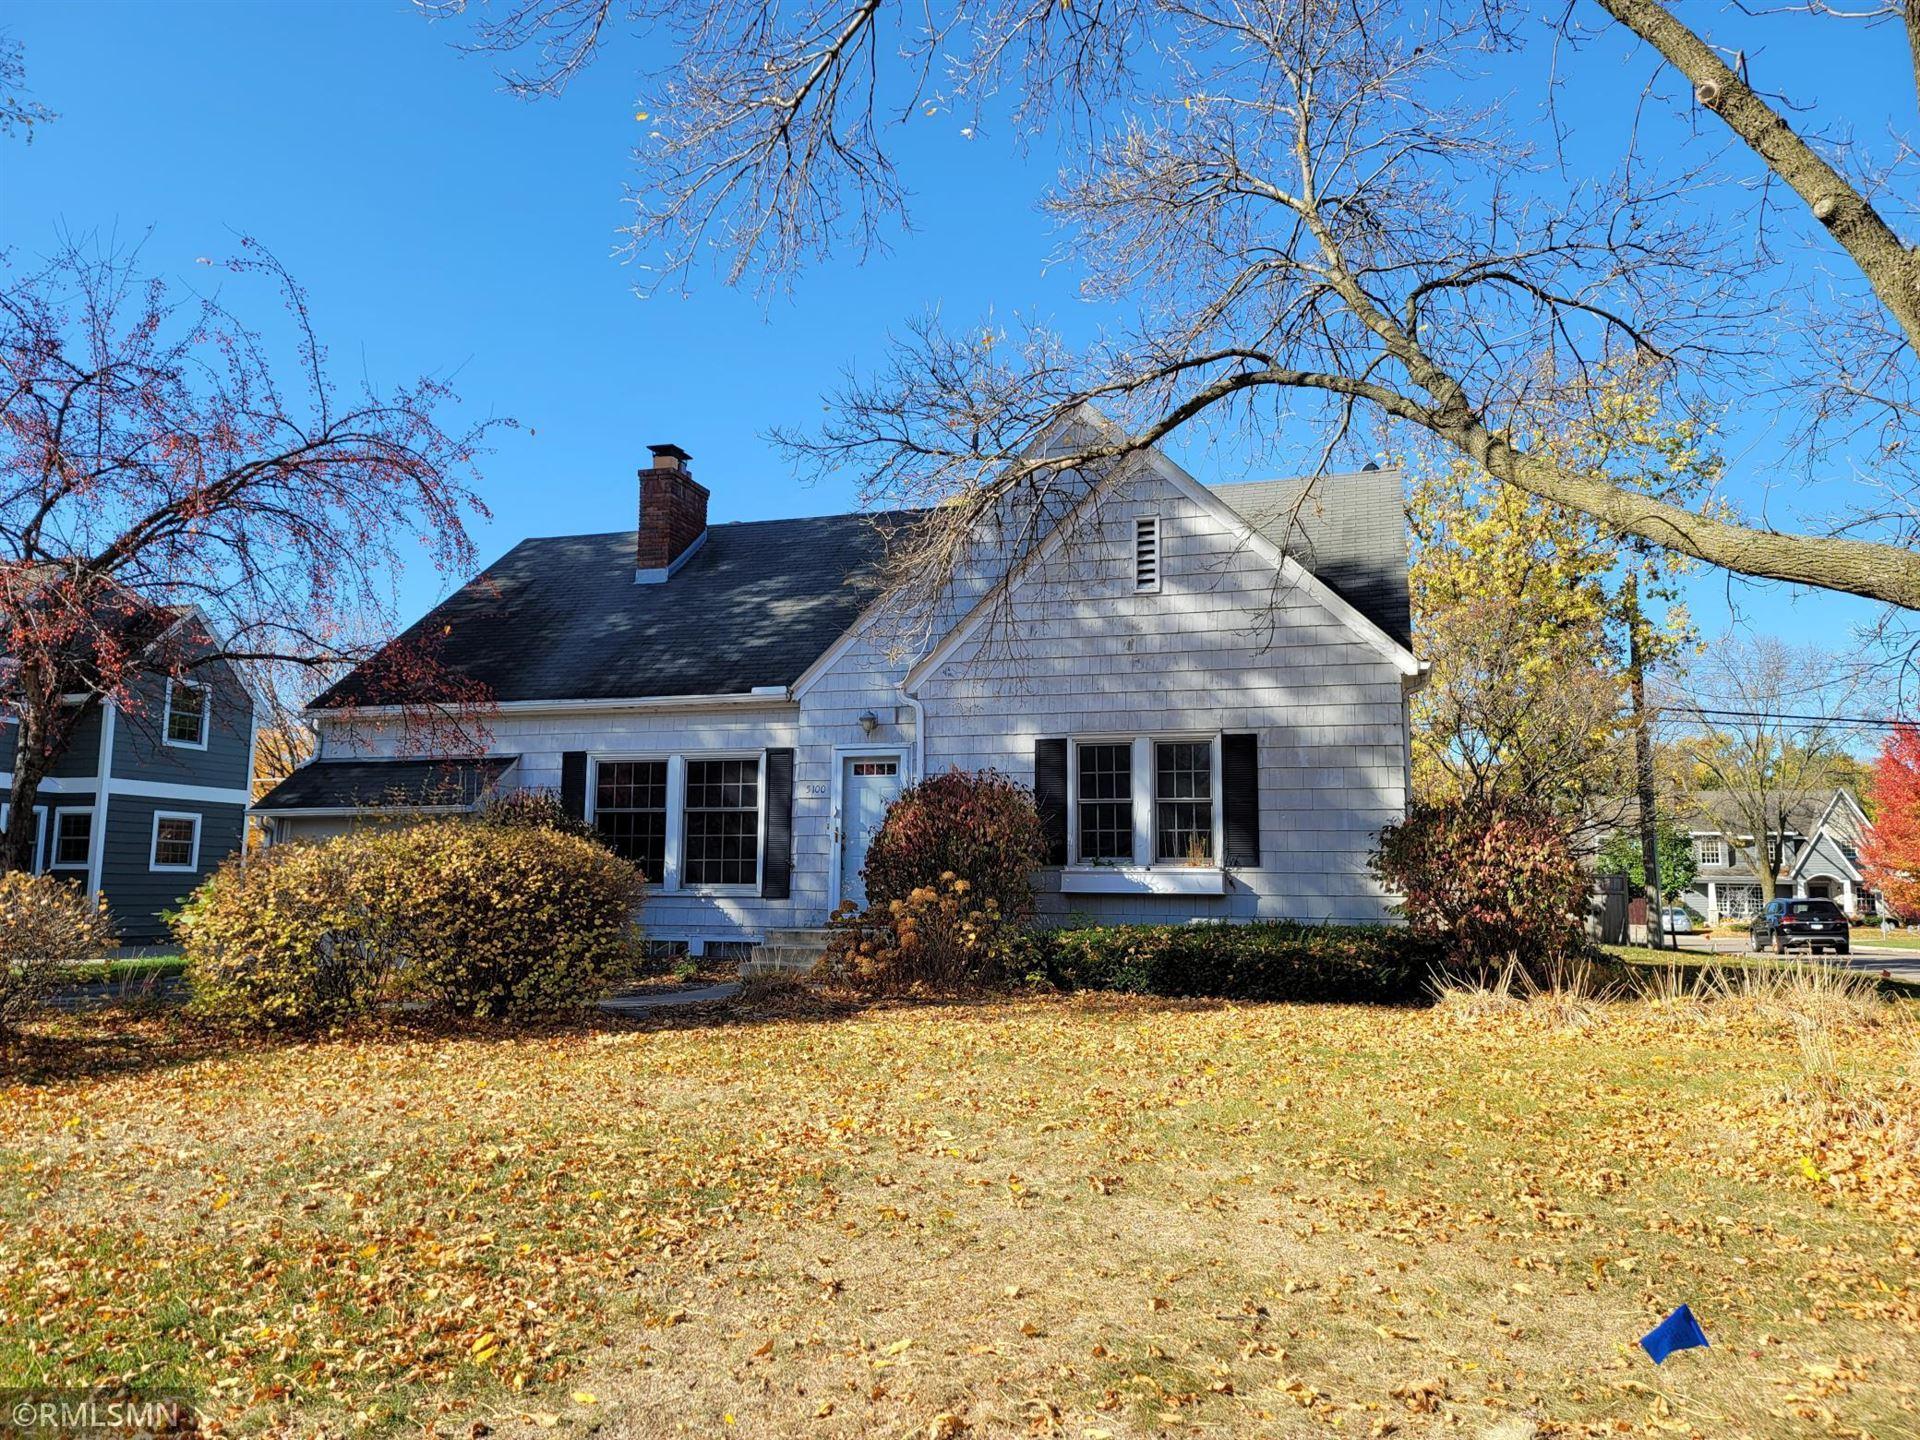 Photo of 5100 Halifax Avenue S, Edina, MN 55424 (MLS # 5679930)